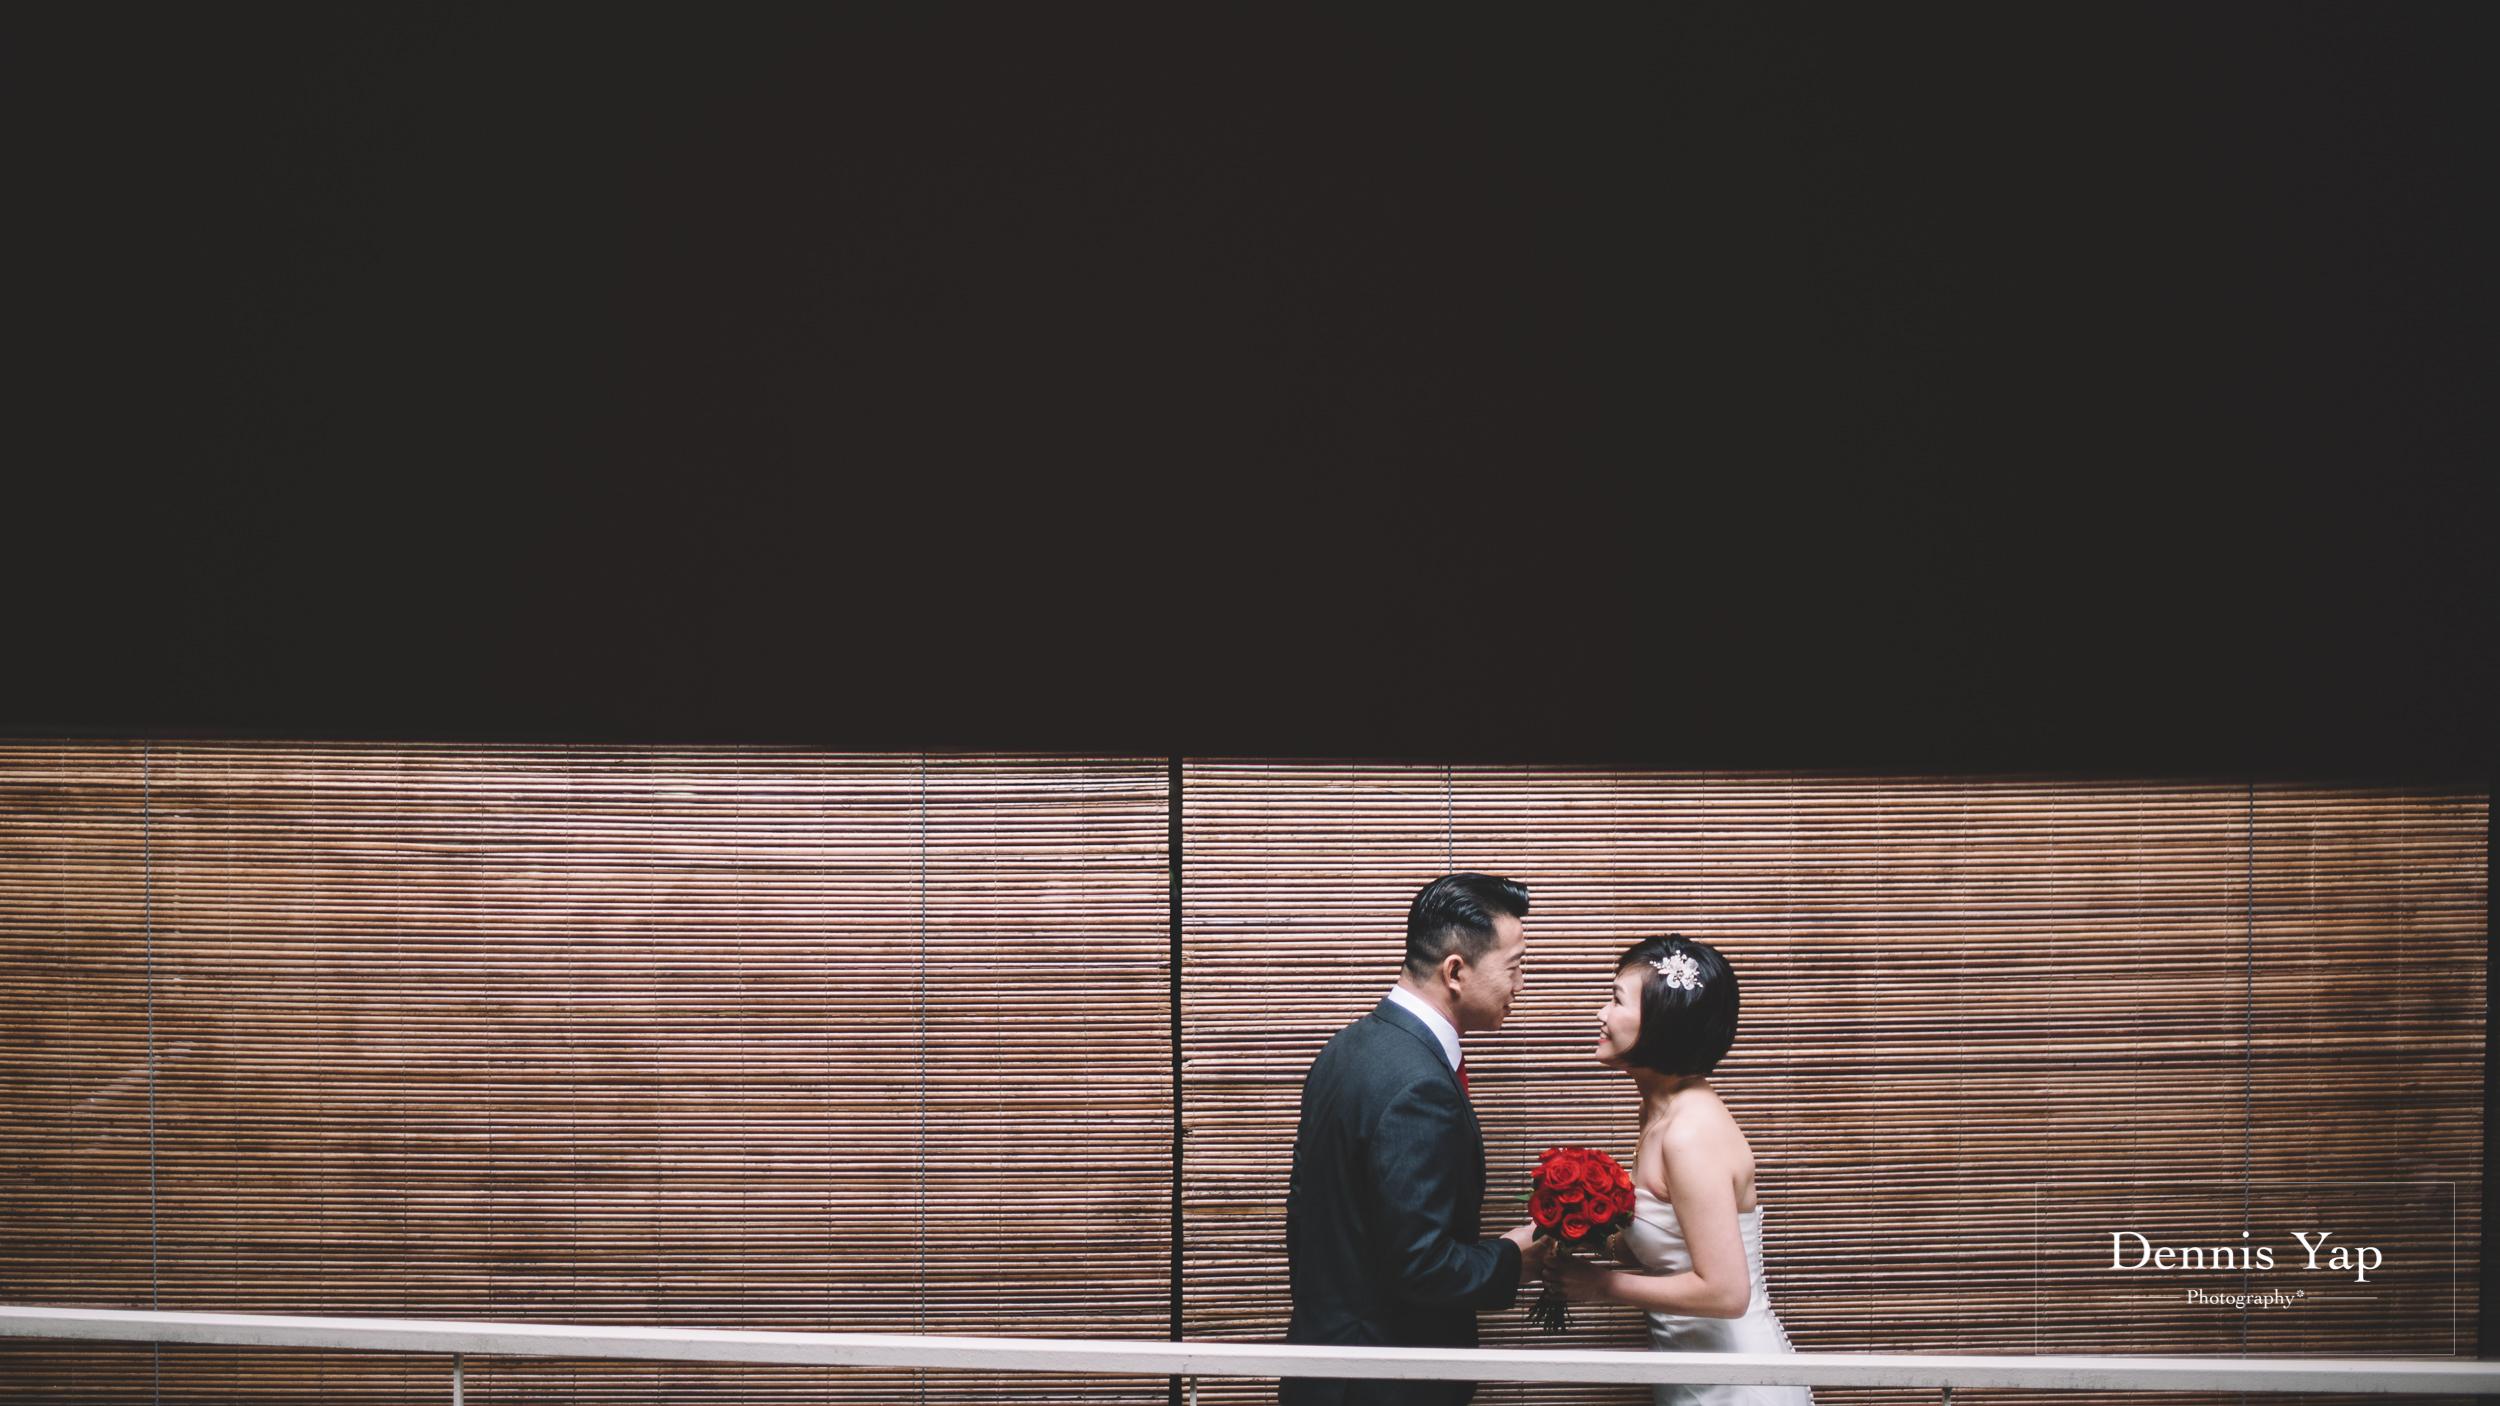 boon weng cyndy love family values pre wedding cameron highlands smoke house dennis yap photography-65.jpg